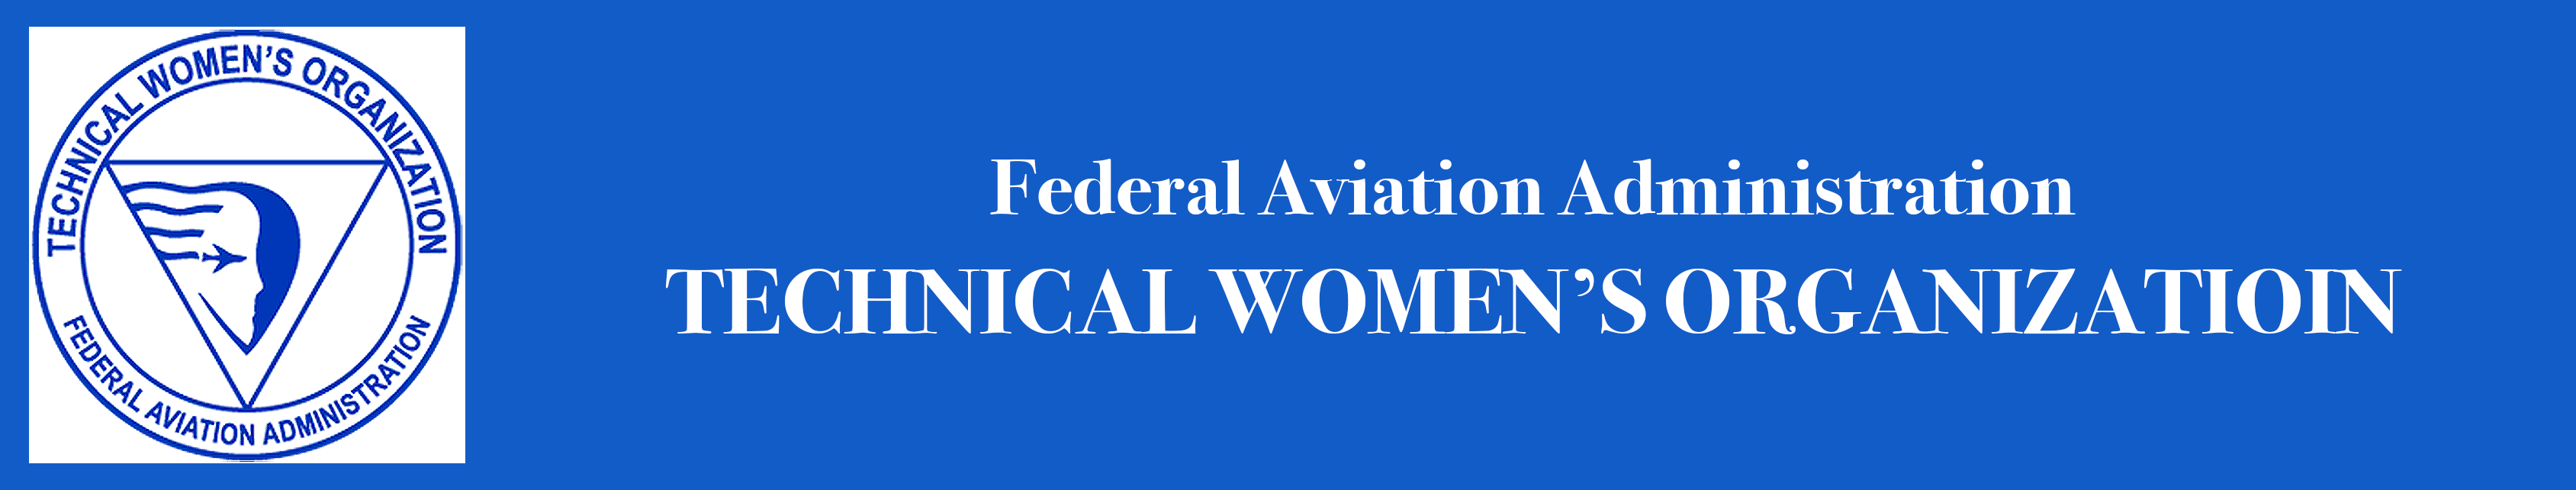 Training N TWO | FAA Technical Women's Organization